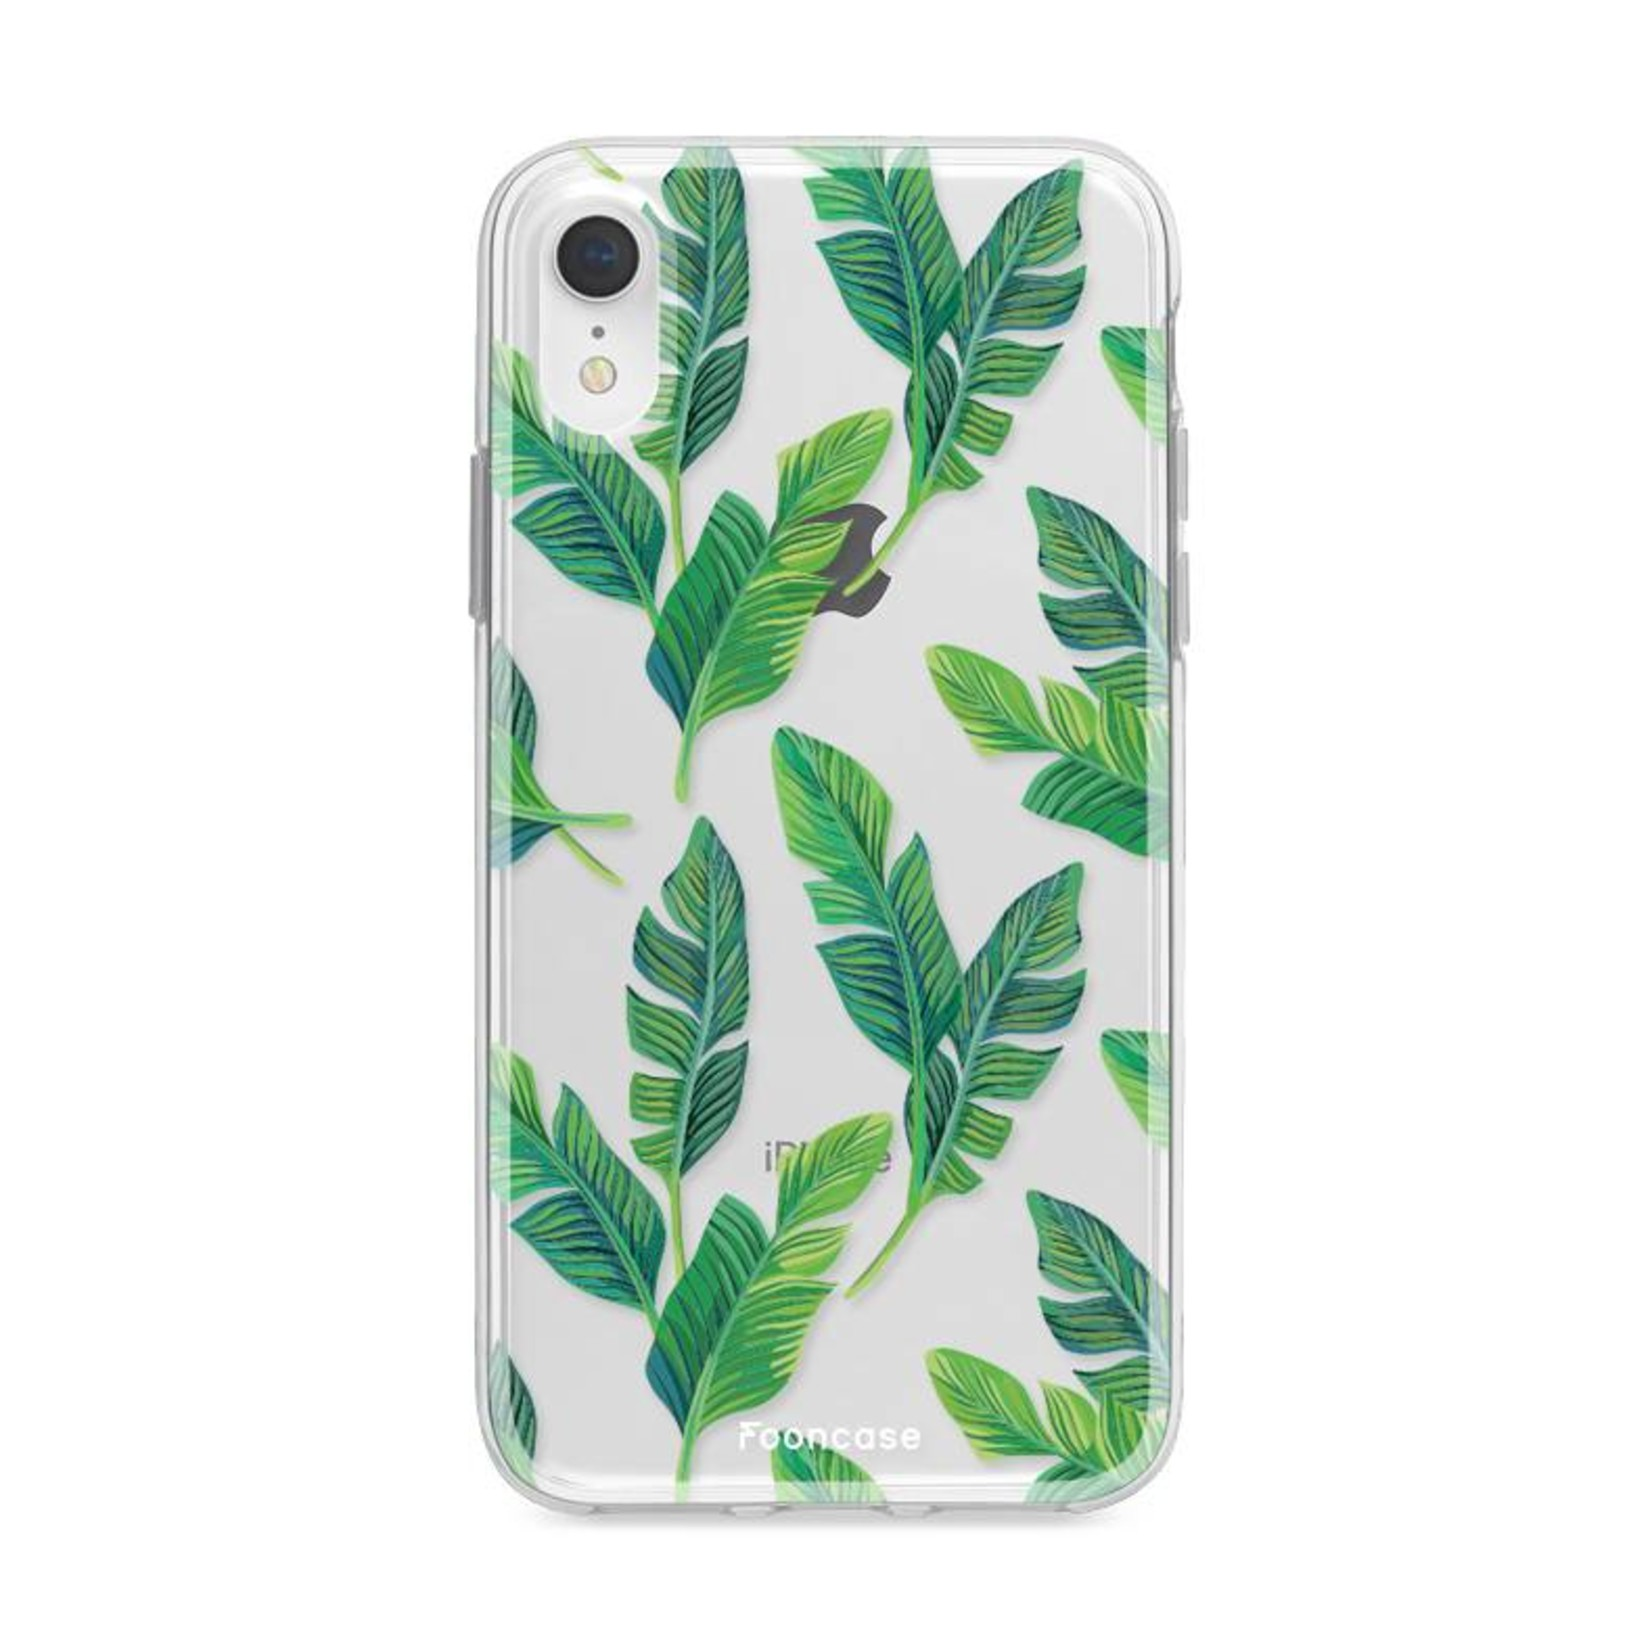 FOONCASE iPhone XR hoesje TPU Soft Case - Back Cover - Banana leaves / Bananen bladeren